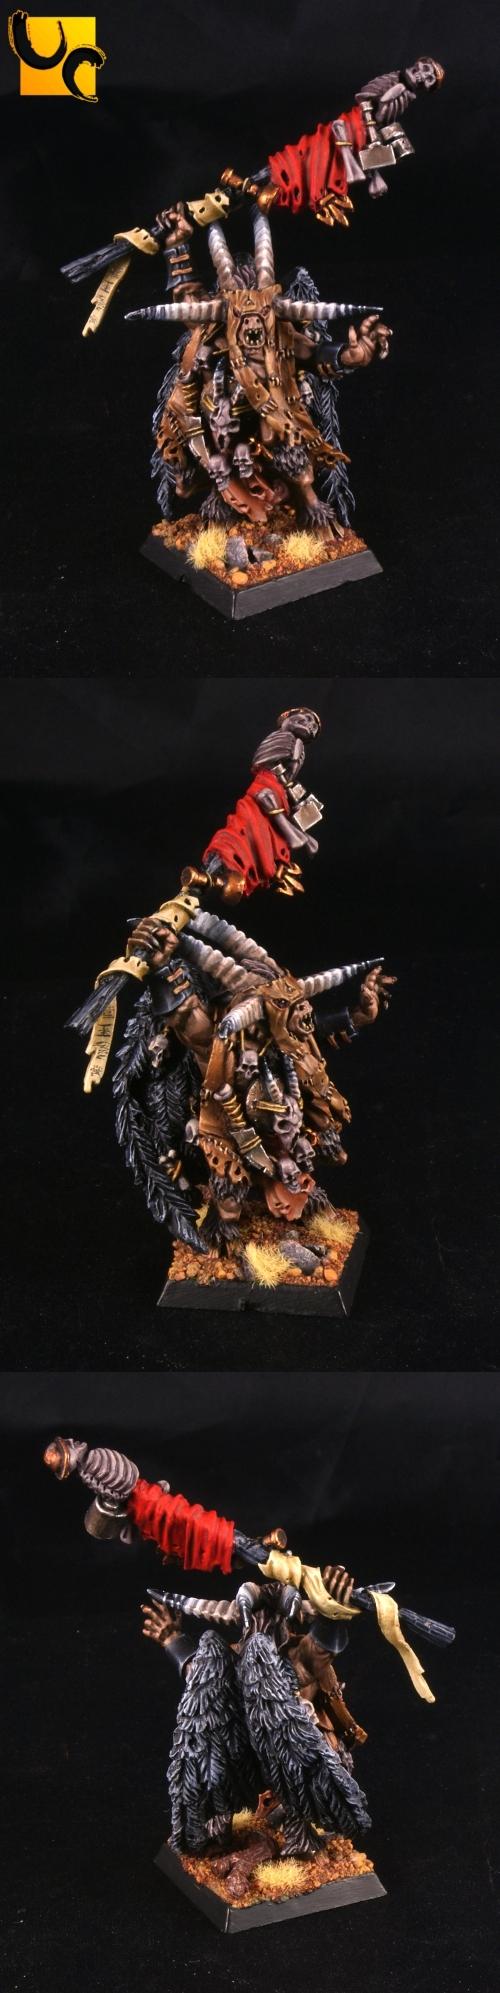 Dominatrix tied up